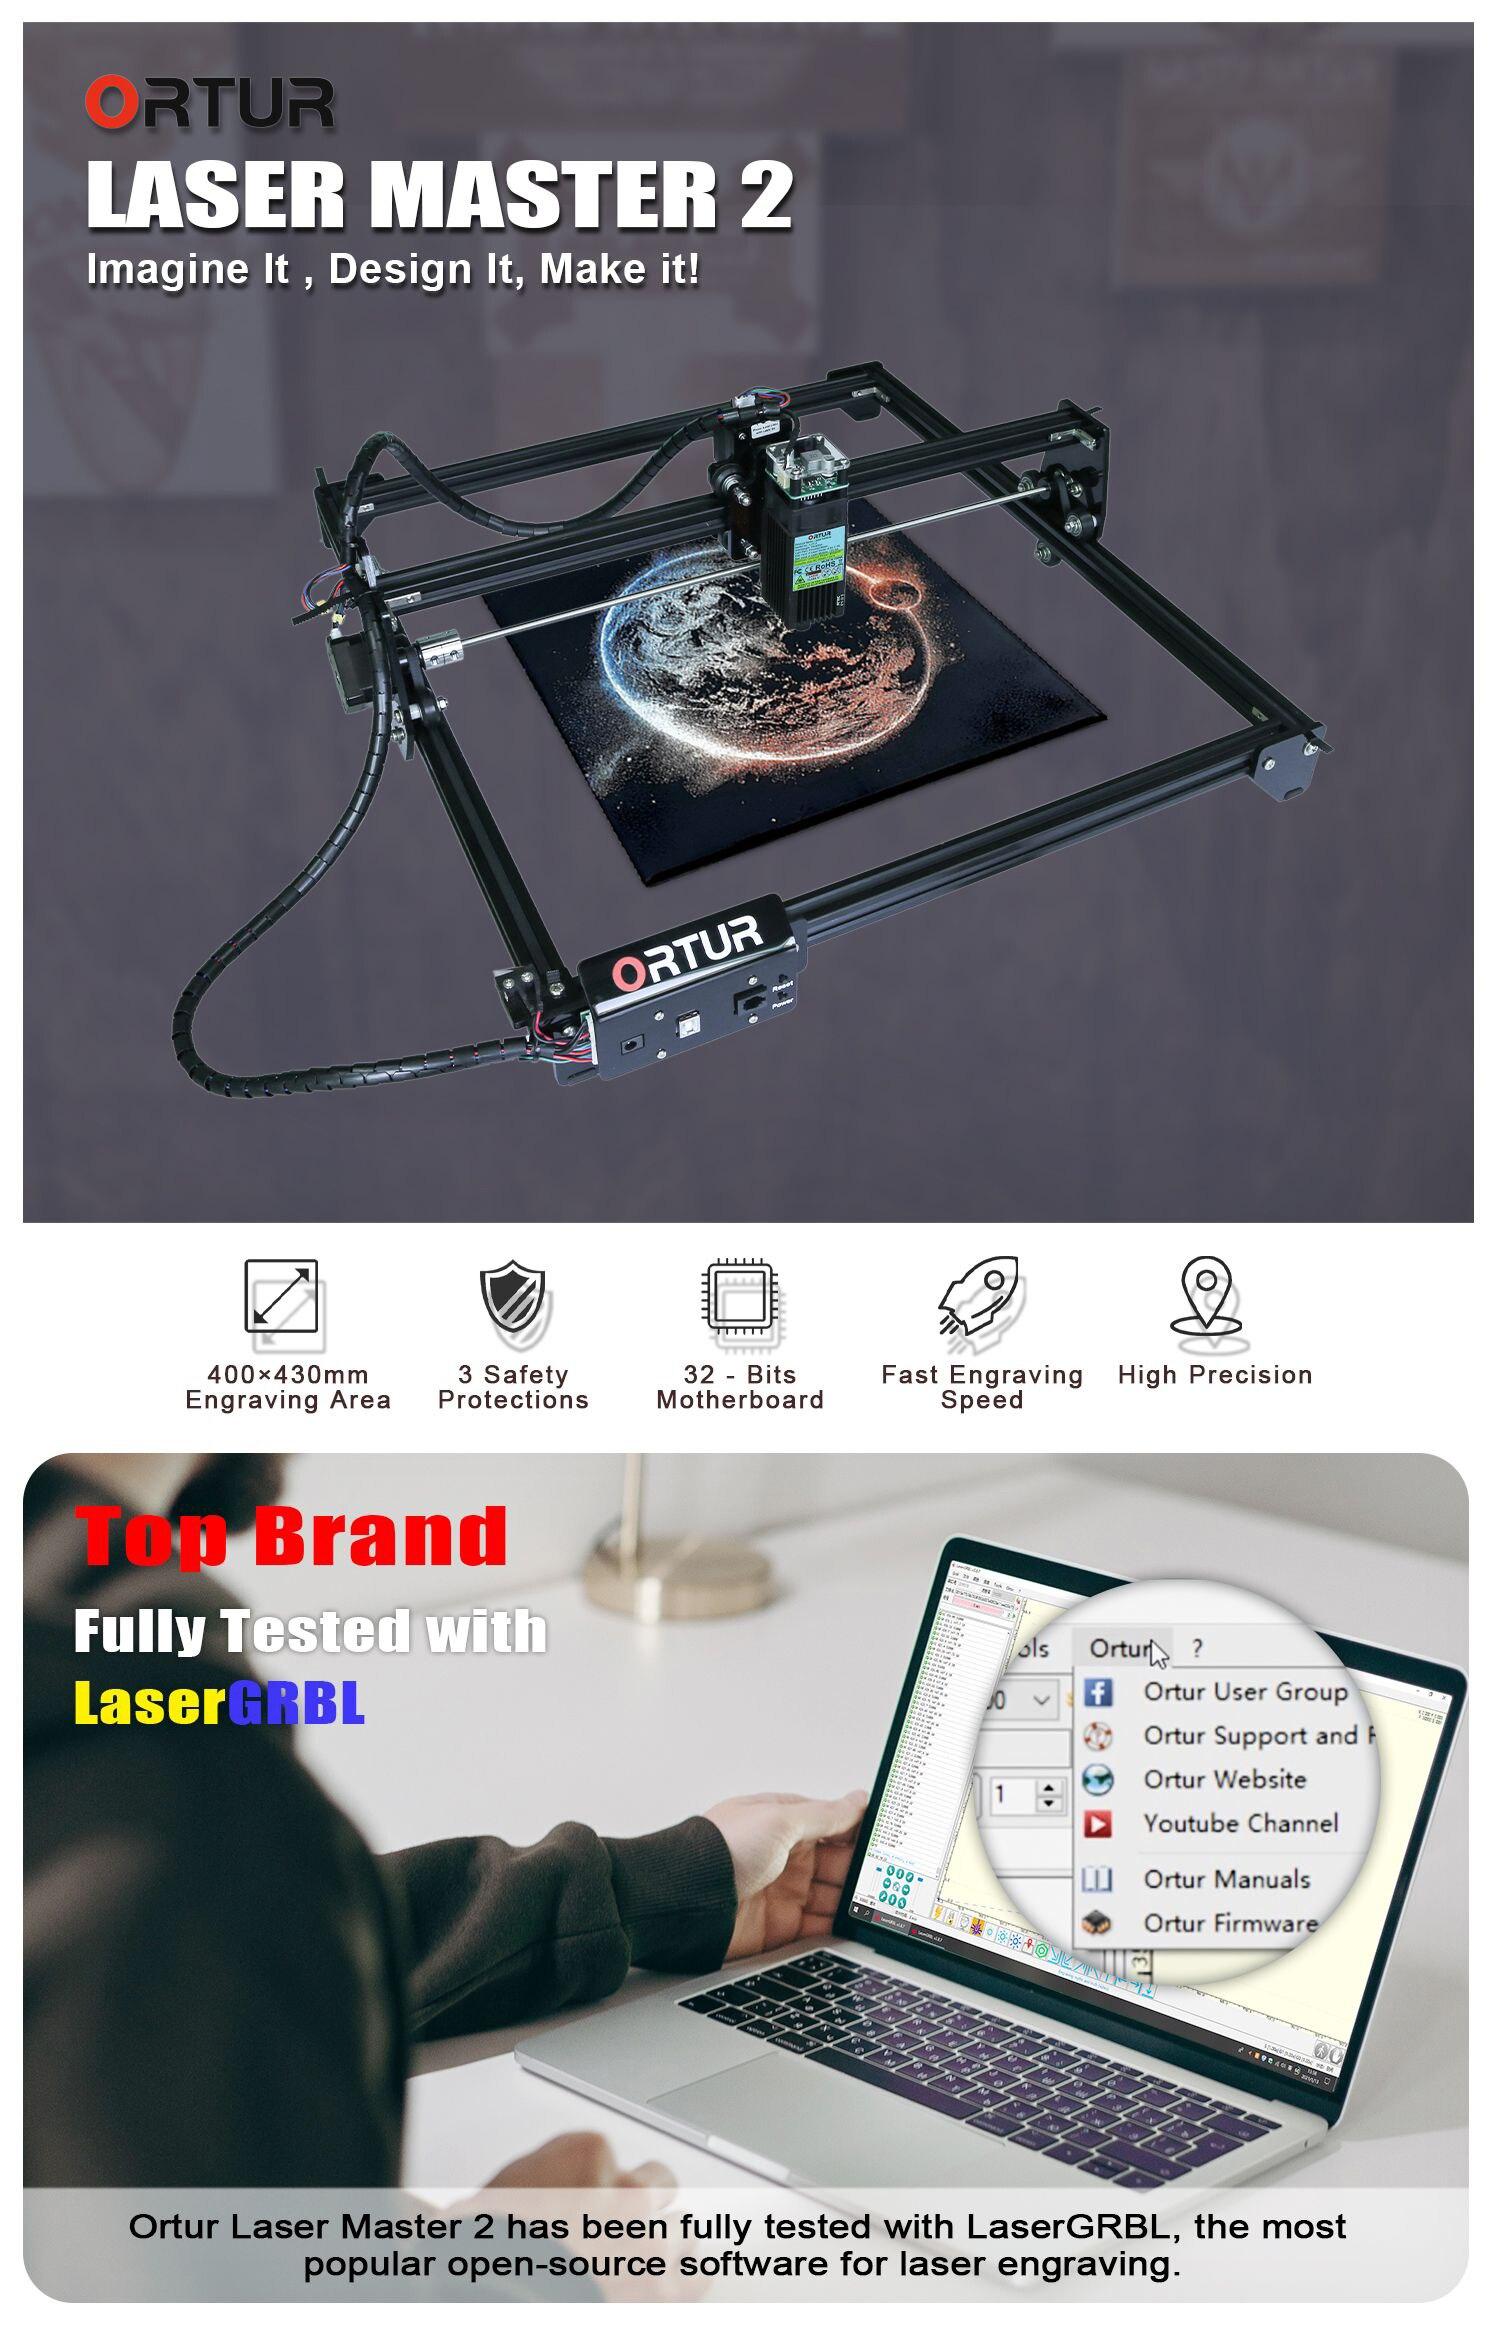 Ortur laser mestre 2 2w máquina de